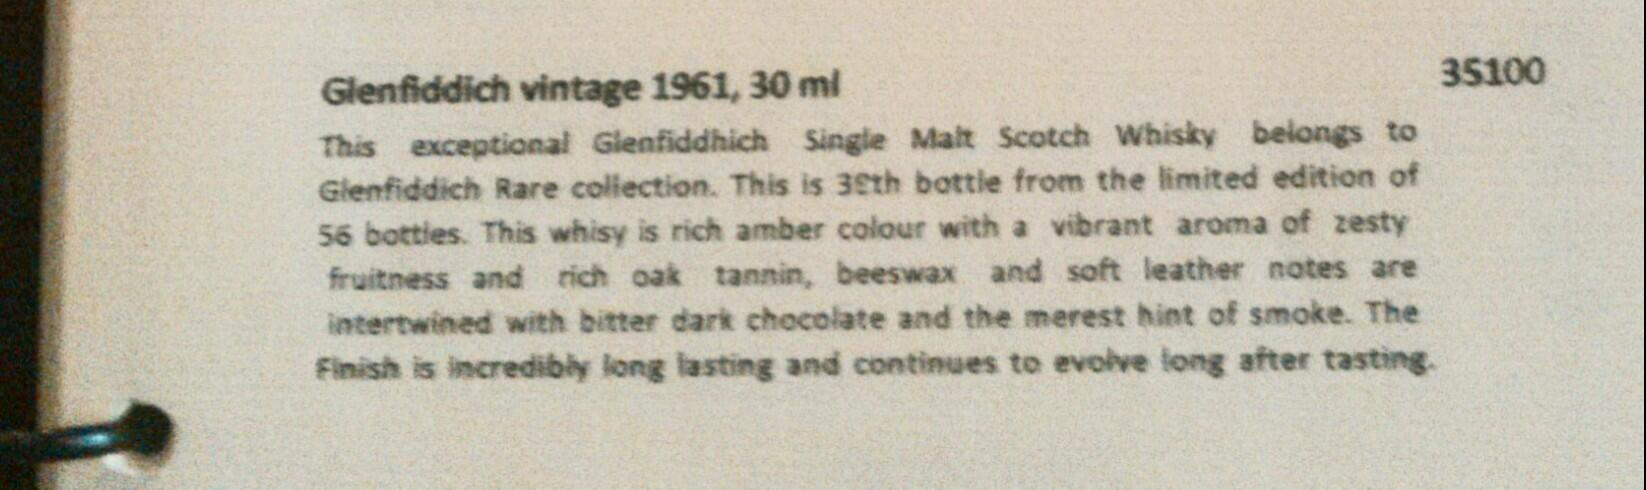 Quick: What's the price per litre of Gelnfiddich 1961 at Hyatt Delhi? http://t.co/bp8dyV9TQ1